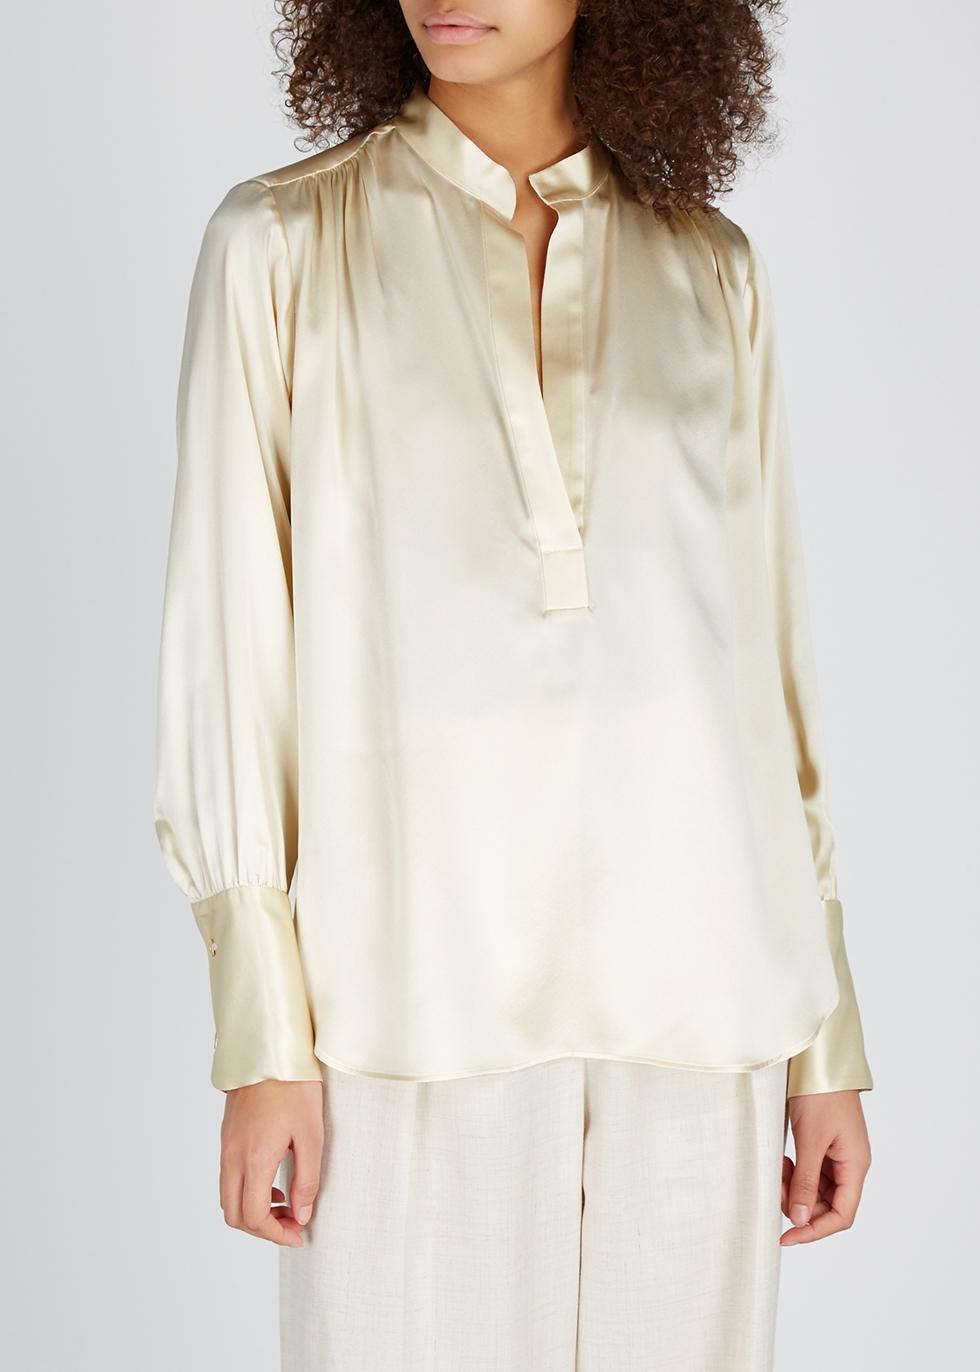 Colette champagne silk-satin blouse - Nili Lotan